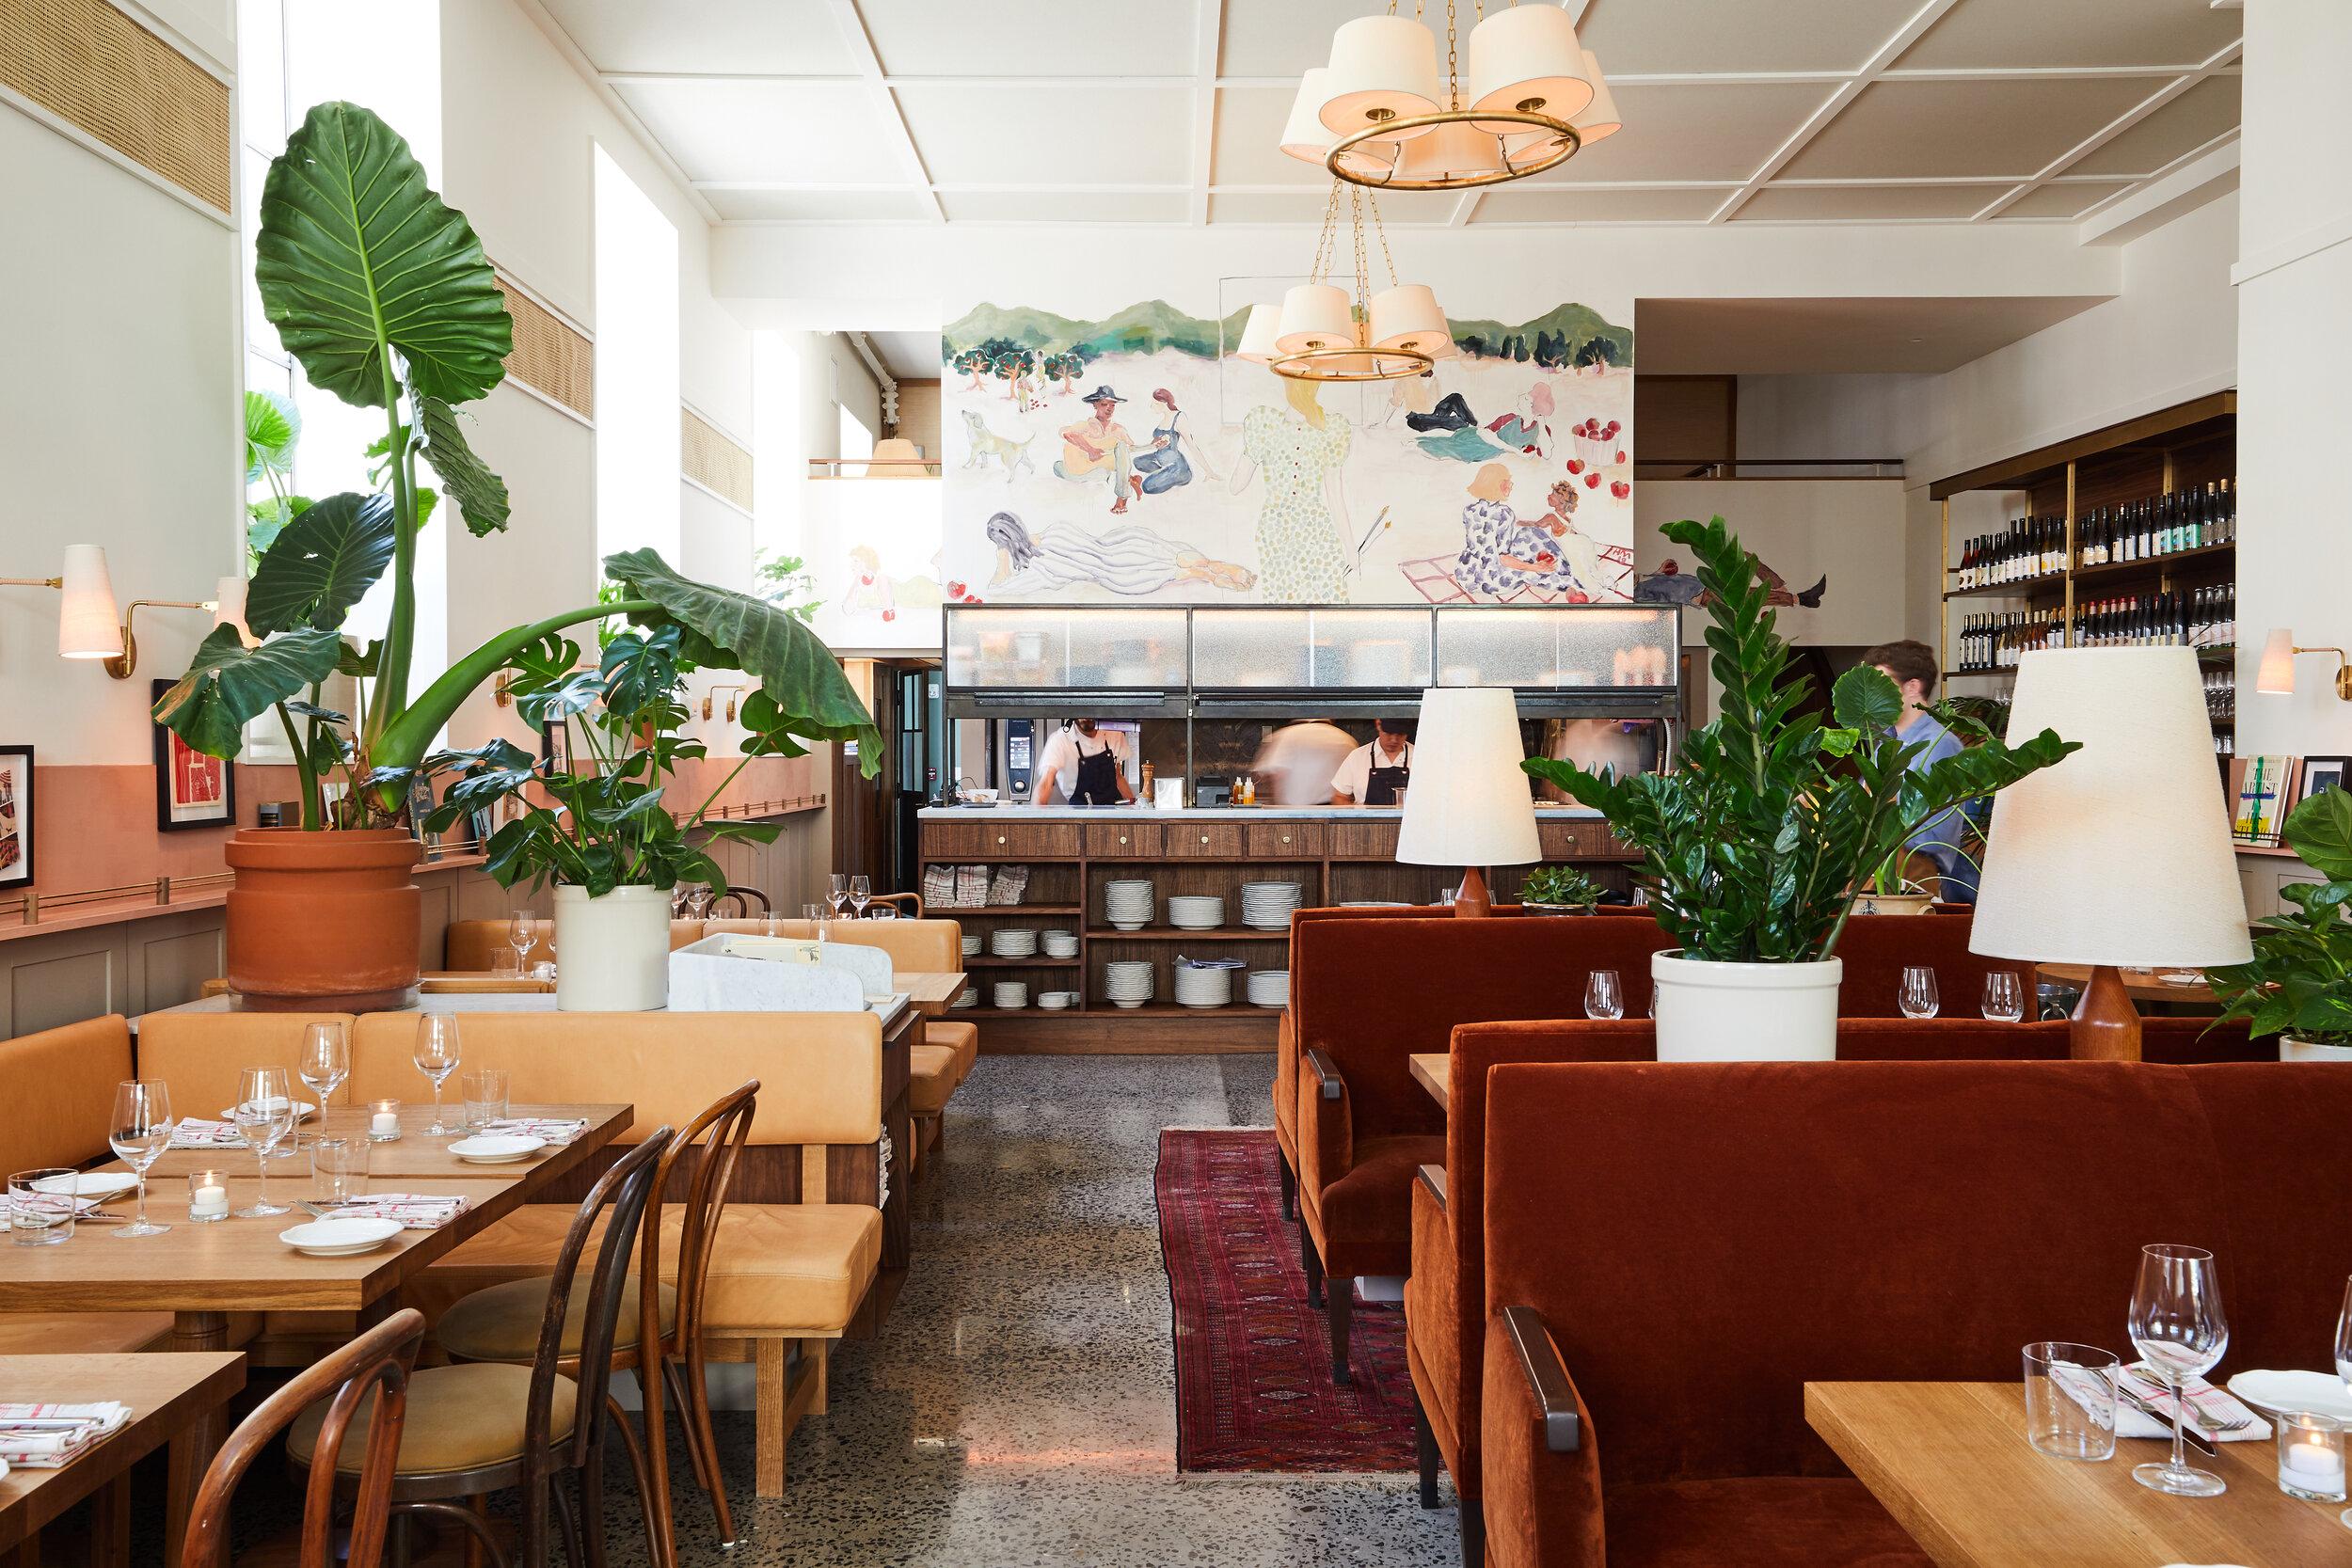 Hotel_Kinsley_Restaurant_Interiors_015.jpg